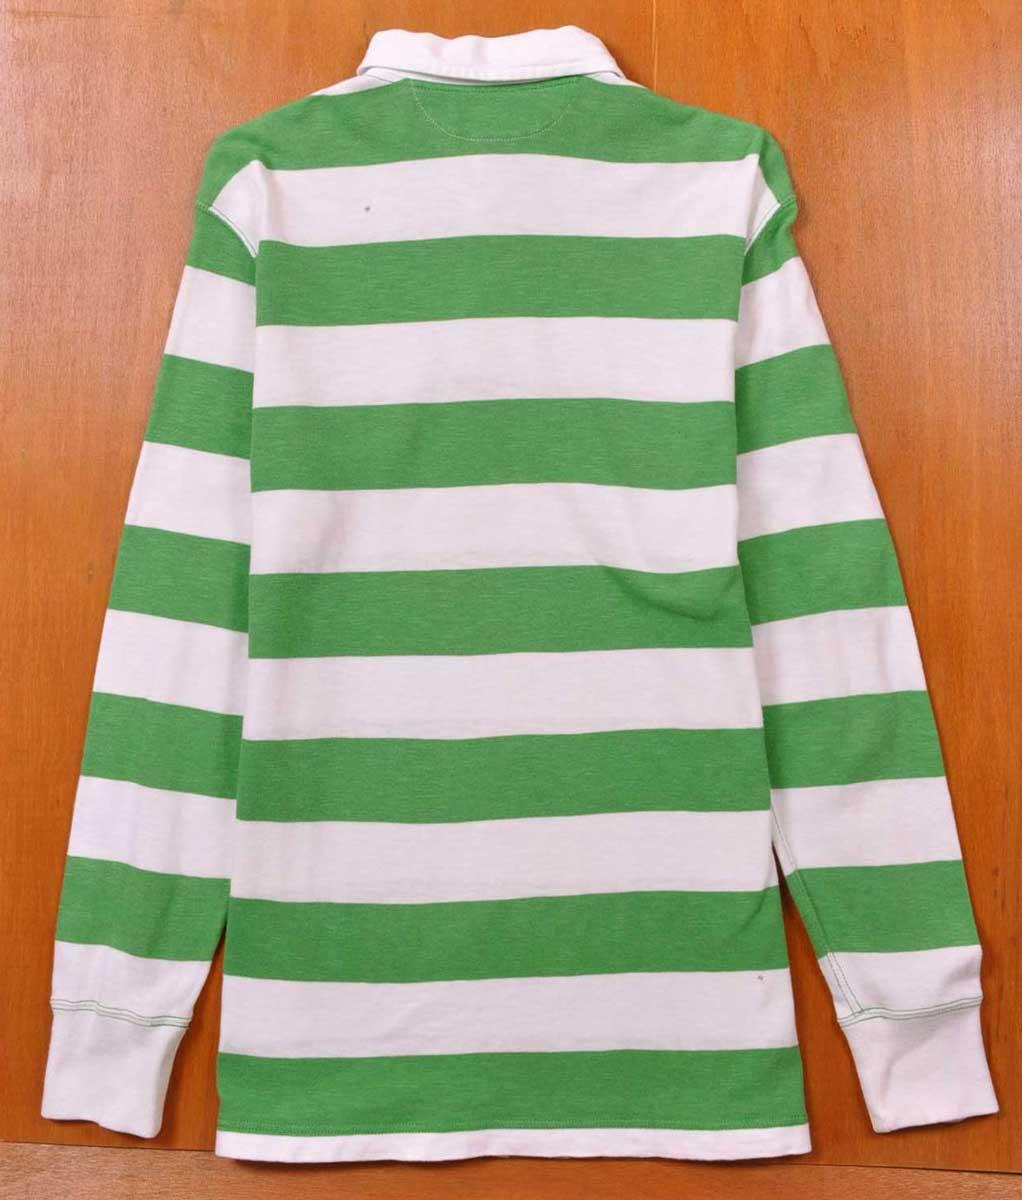 9239dc1e ... Polo Ralph Lauren polo Ralph Lauren long sleeves rugby shirt long  sleeves polo shirt green X ...